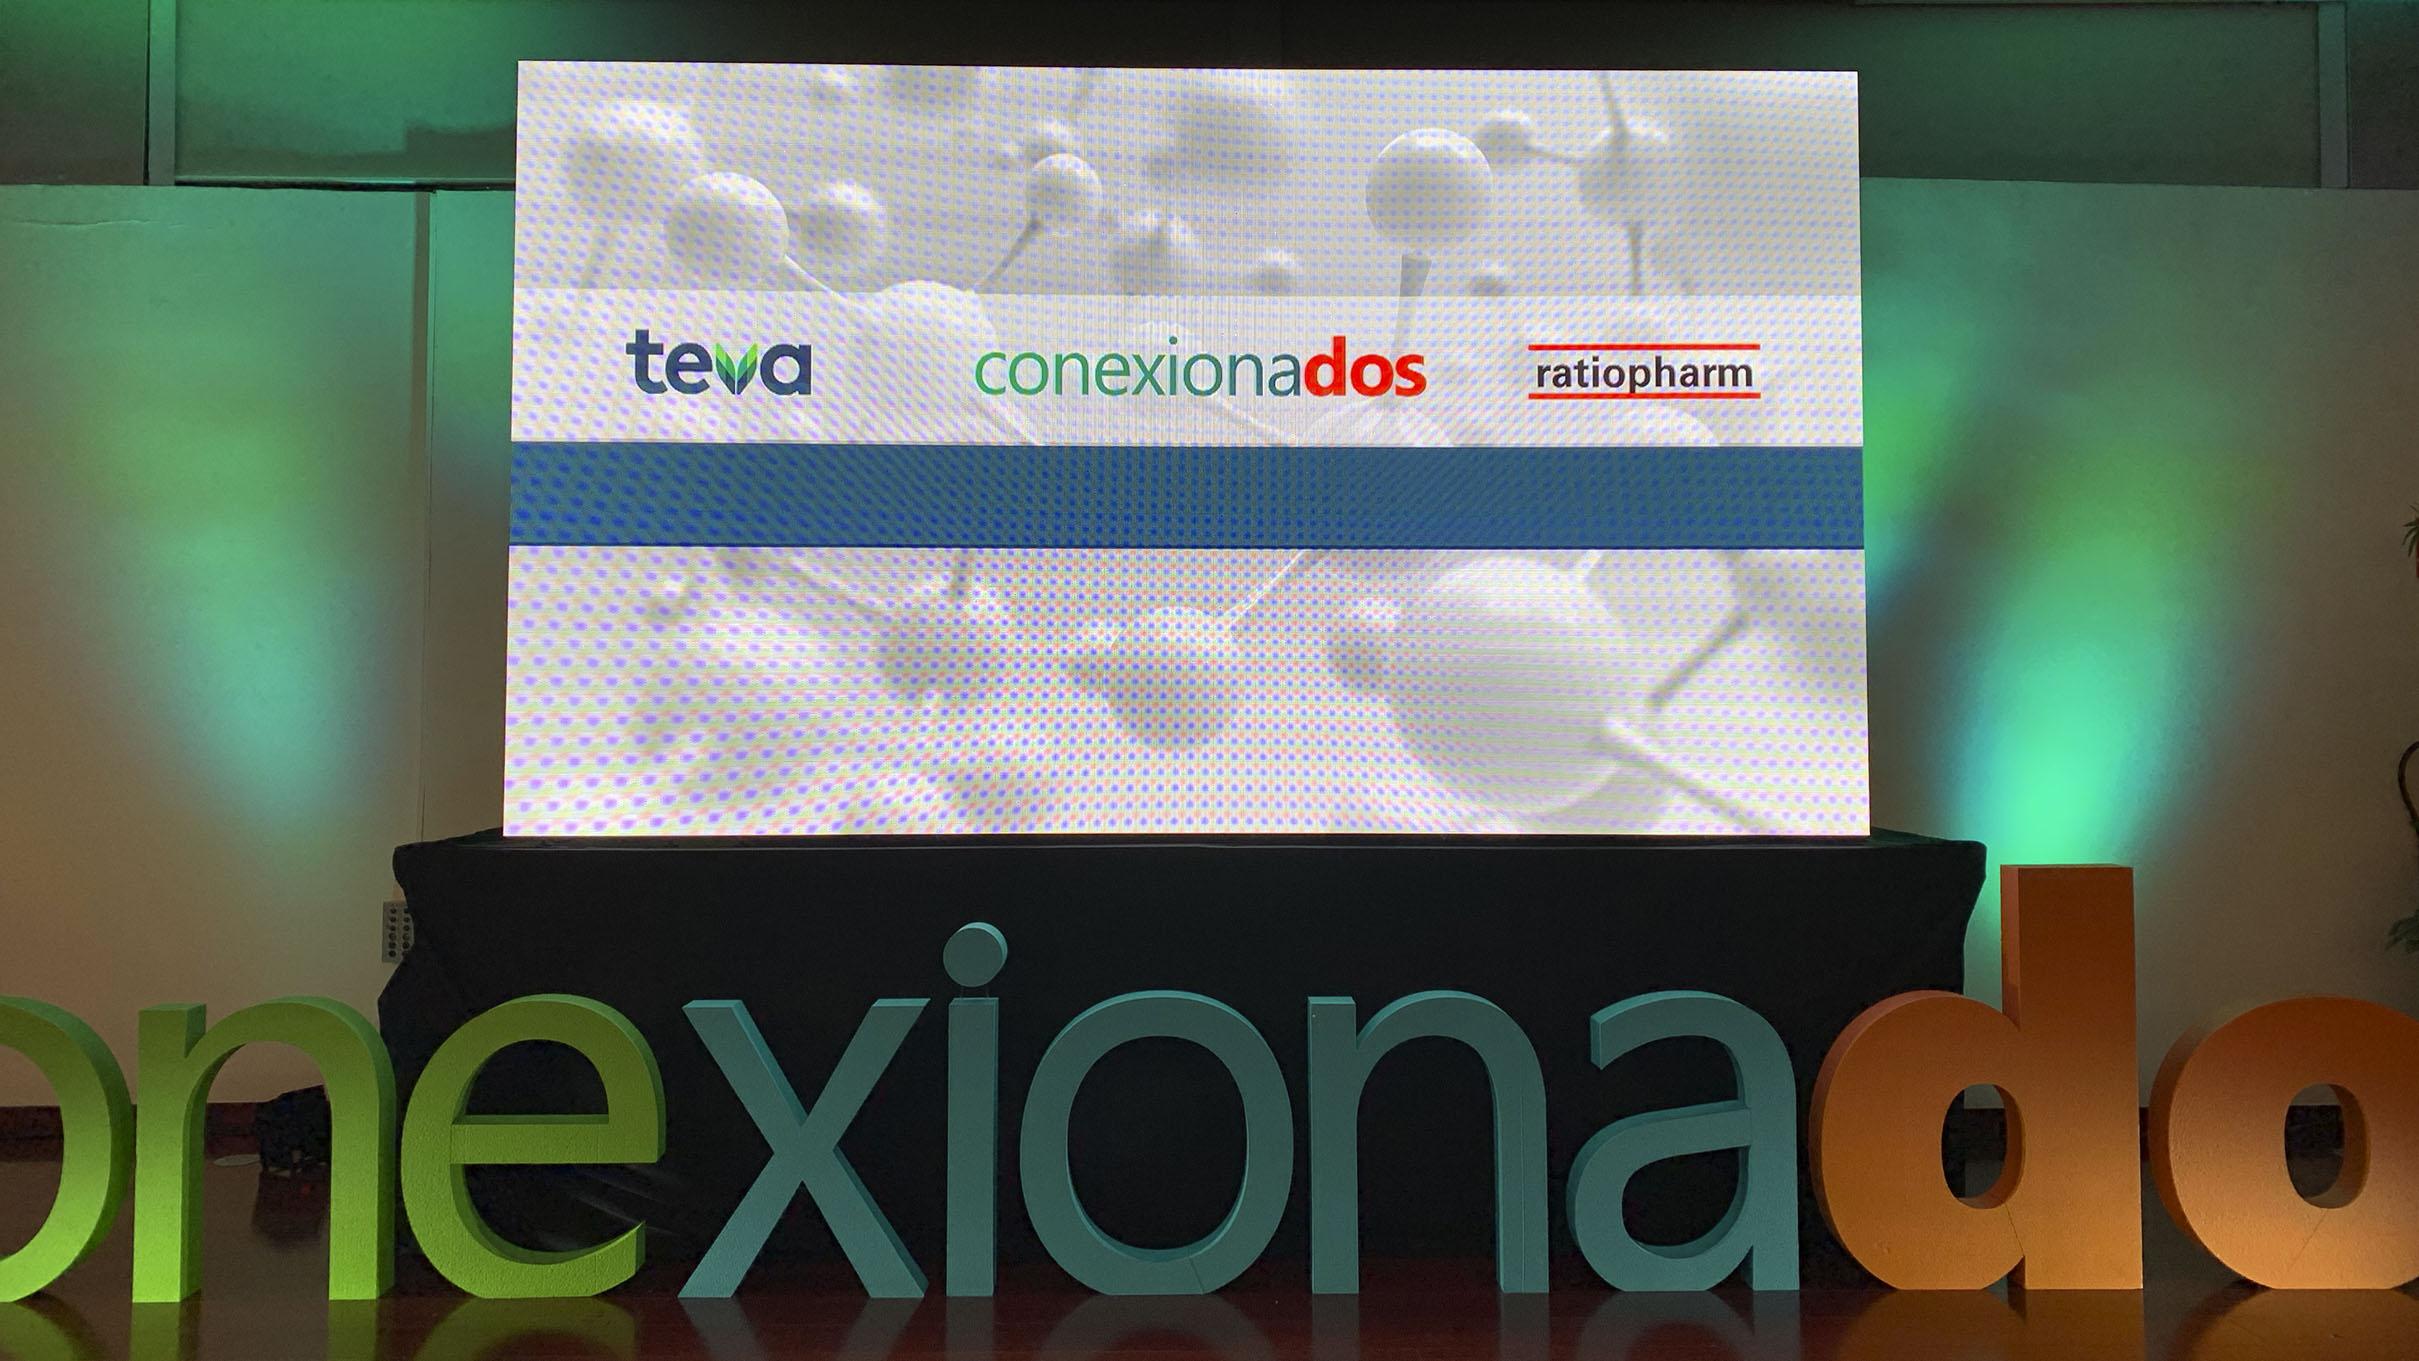 Teva-conexionados-Madrid-dic-2019-01